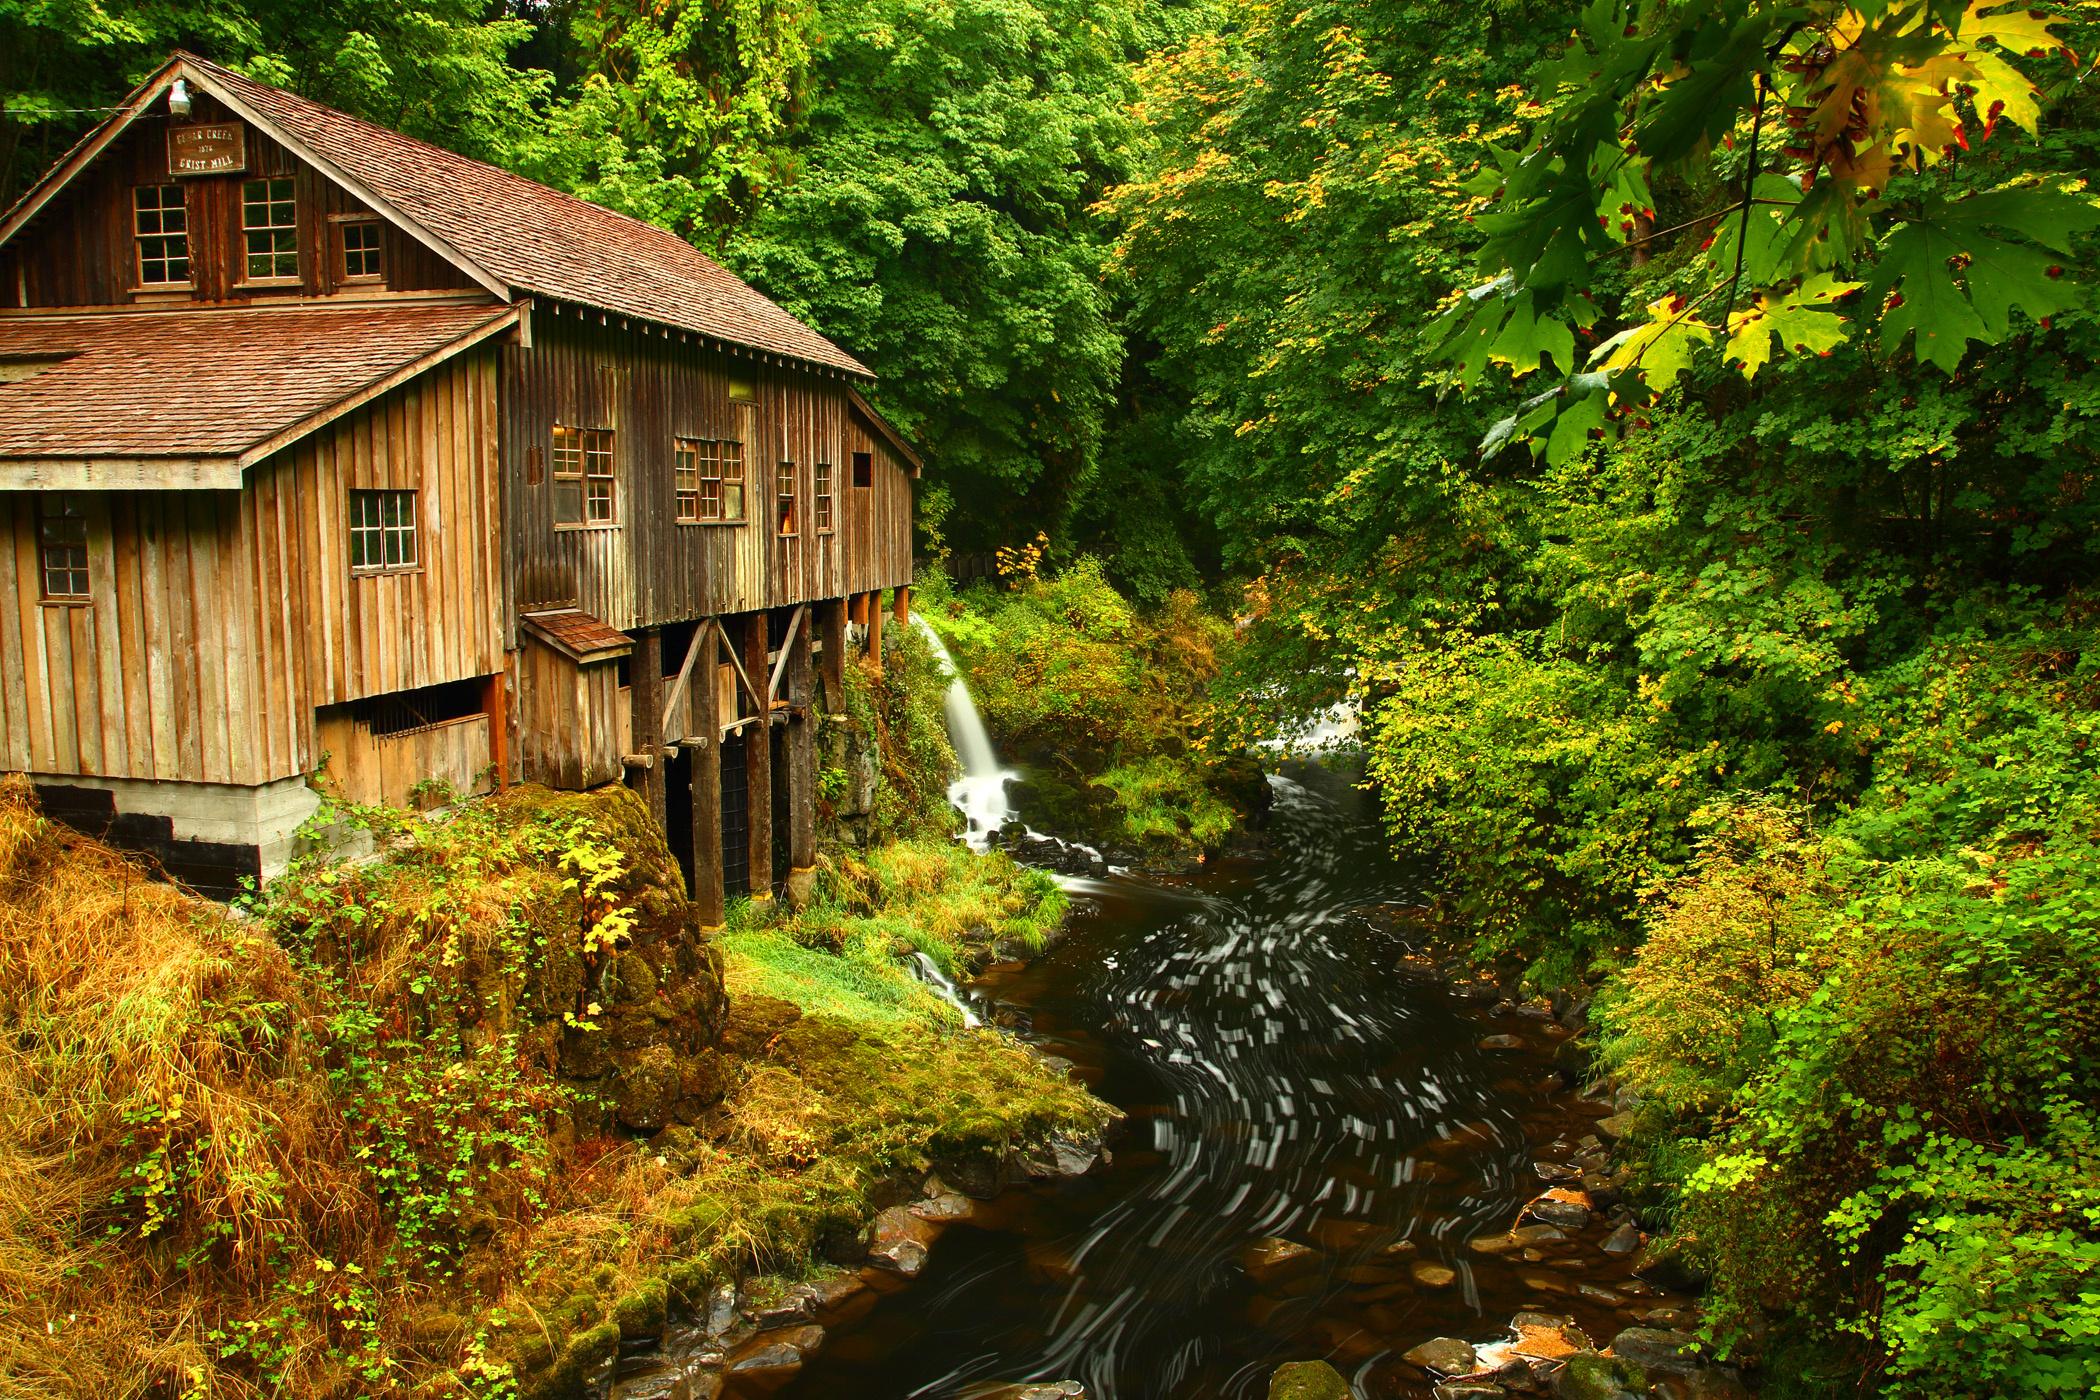 Cedar Creek Grist Mill autumn river stream forest house building fall 2100x1400